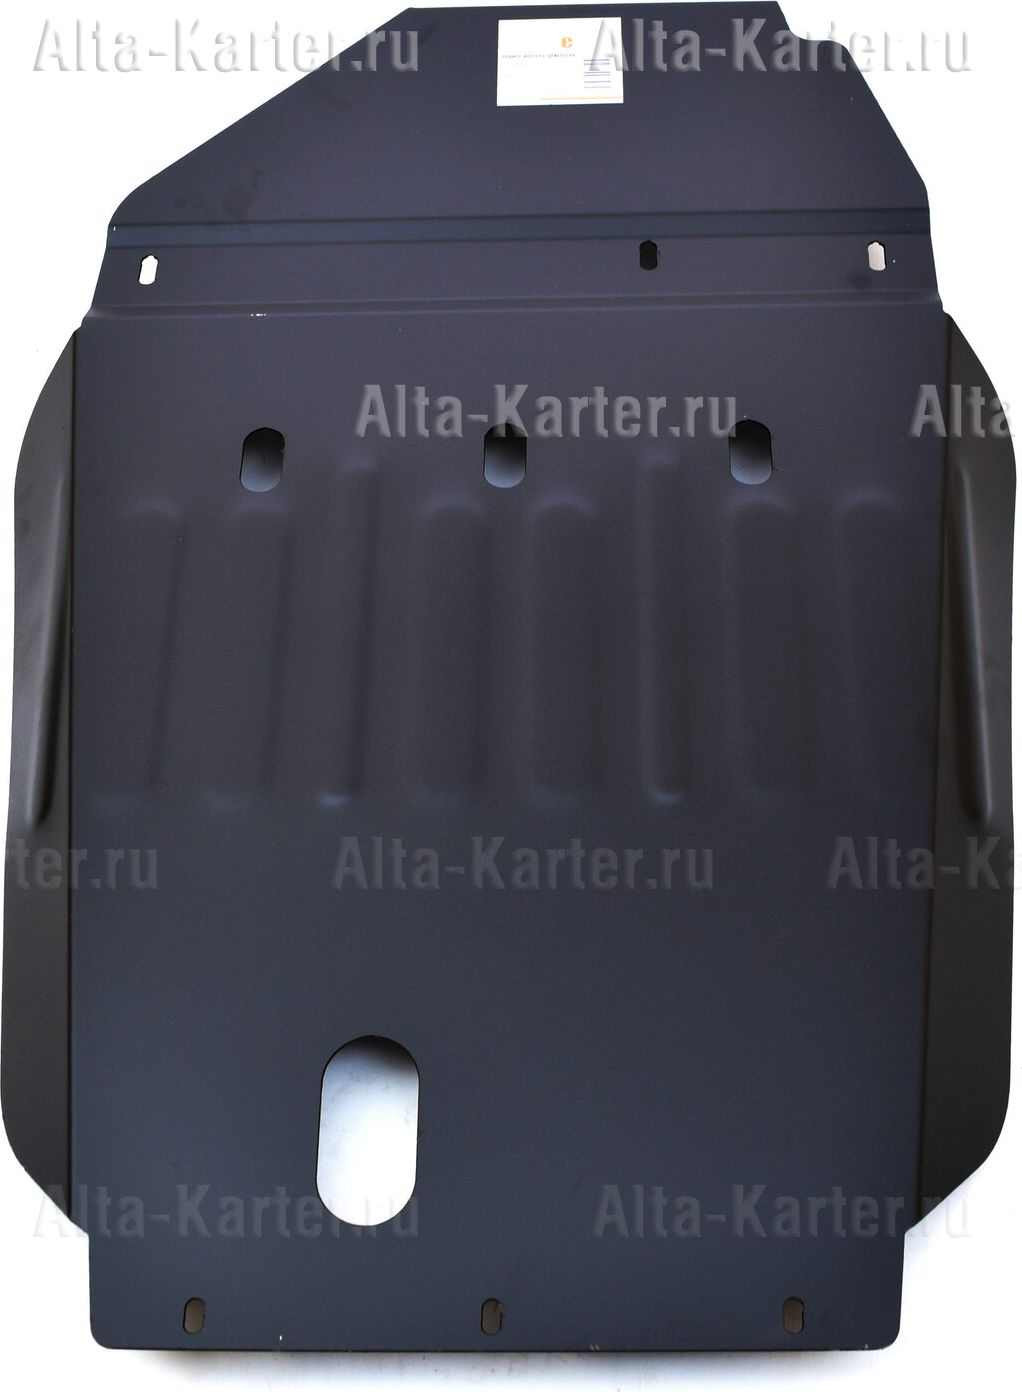 Защита Alfeco для АКПП и РК Toyota Land Cruiser 100 1998-2007. Артикул ALF.24.47